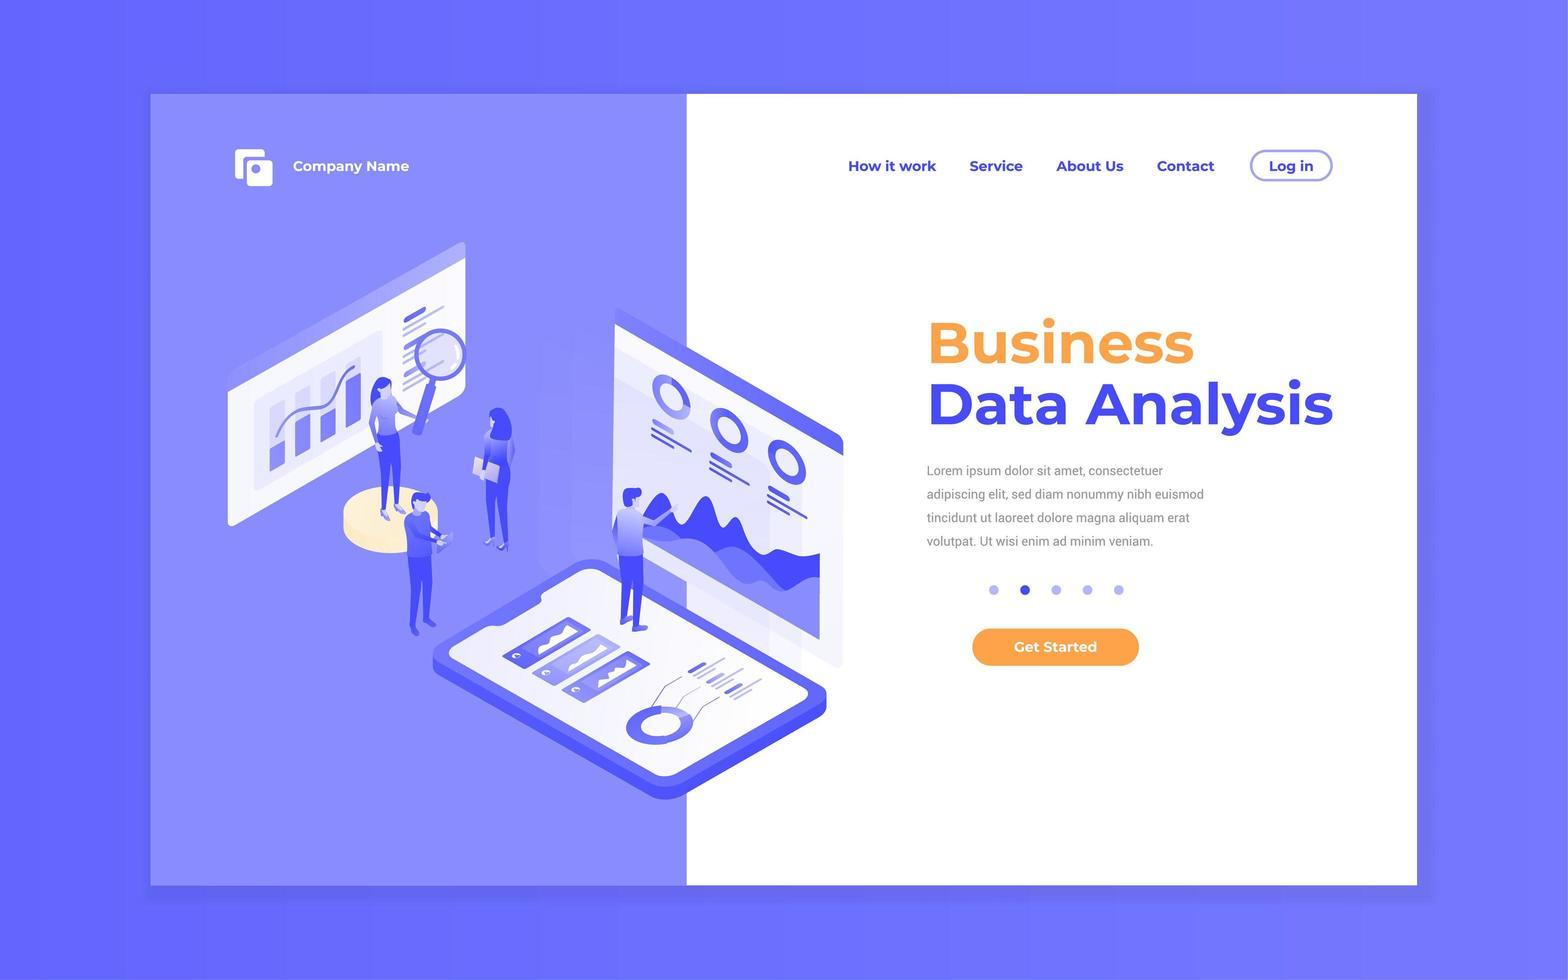 lila Datenanalyse-Website und mobiles Website-Konzept vektor